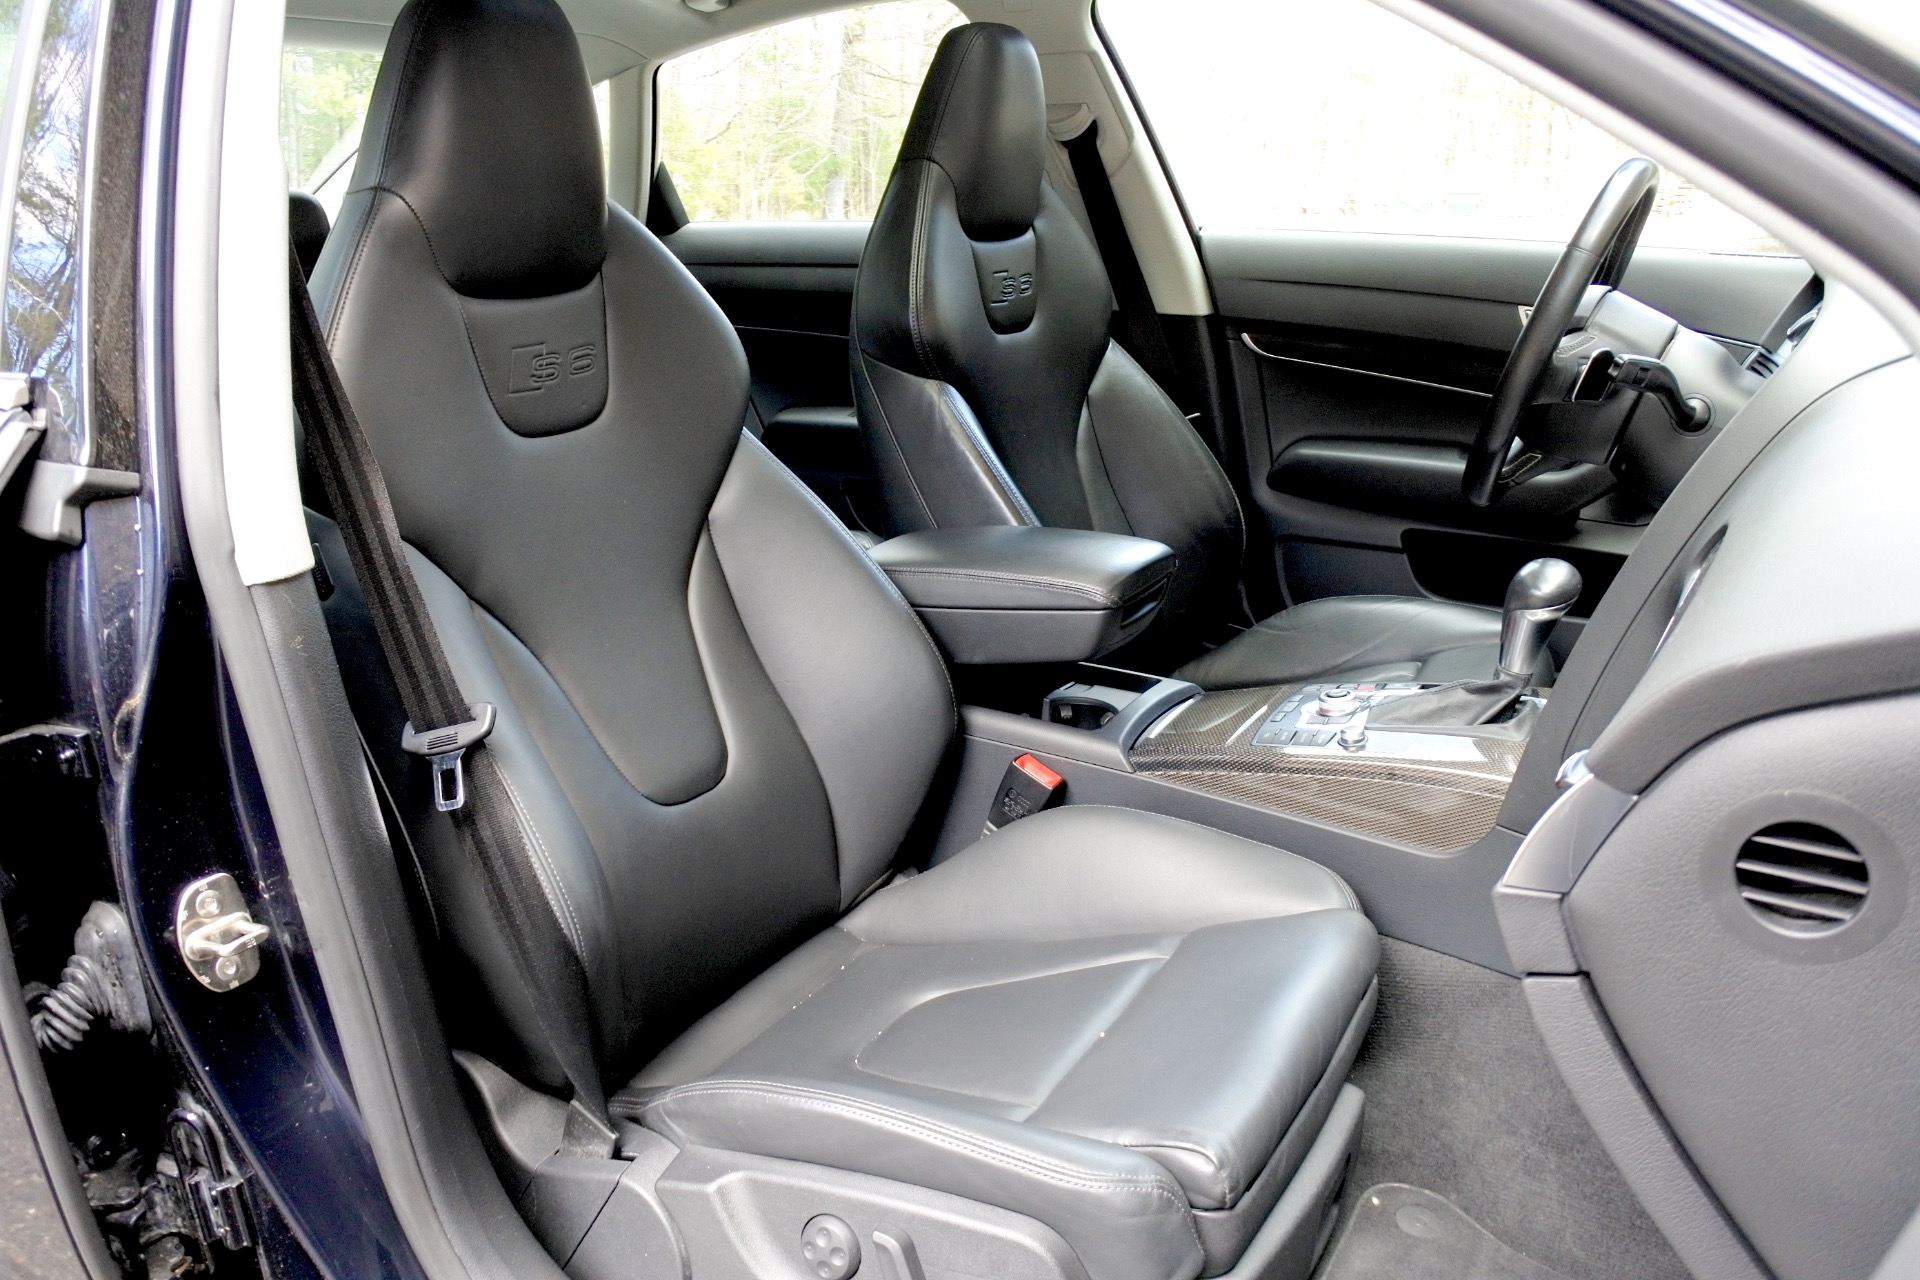 Used 2011 Audi S6 5.2 Prestige Quattro Used 2011 Audi S6 5.2 Prestige Quattro for sale  at Metro West Motorcars LLC in Shrewsbury MA 17